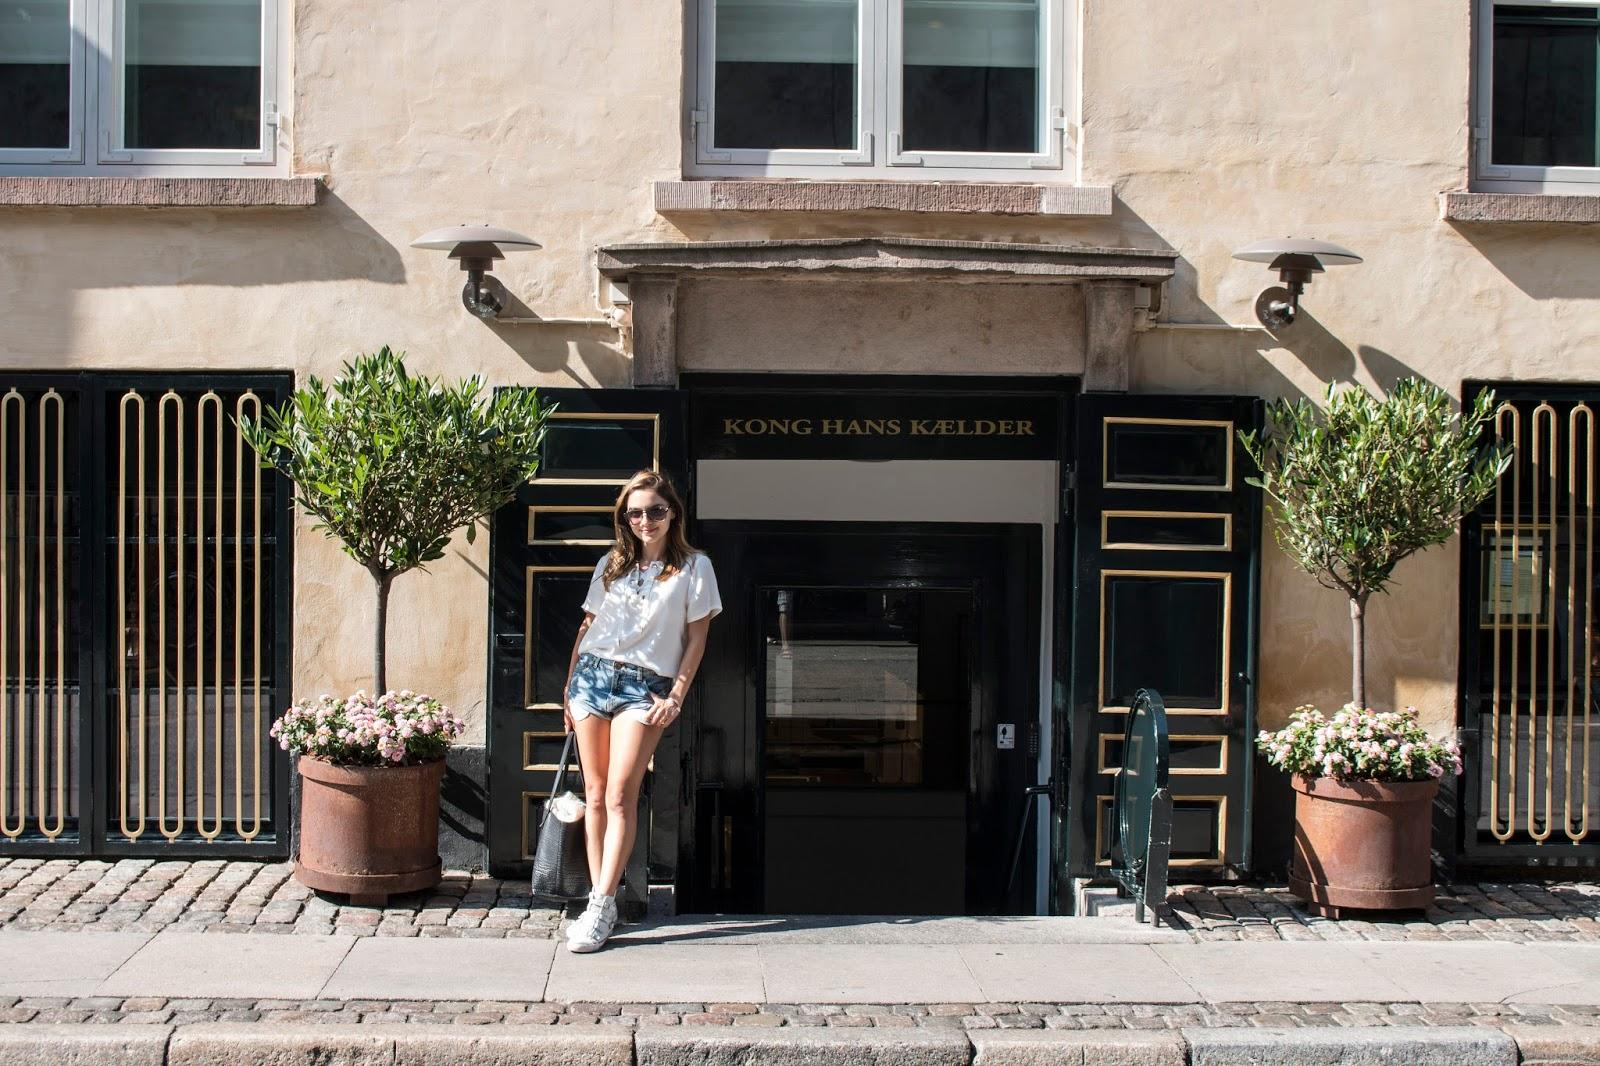 Whitney's Wondeland UK Top Gourmet Luxury Restaurant Critique and Food Blogger reviews Kong Hans Kaelder in Copenhagen, one of the best Michelin Star restaurants in the world.